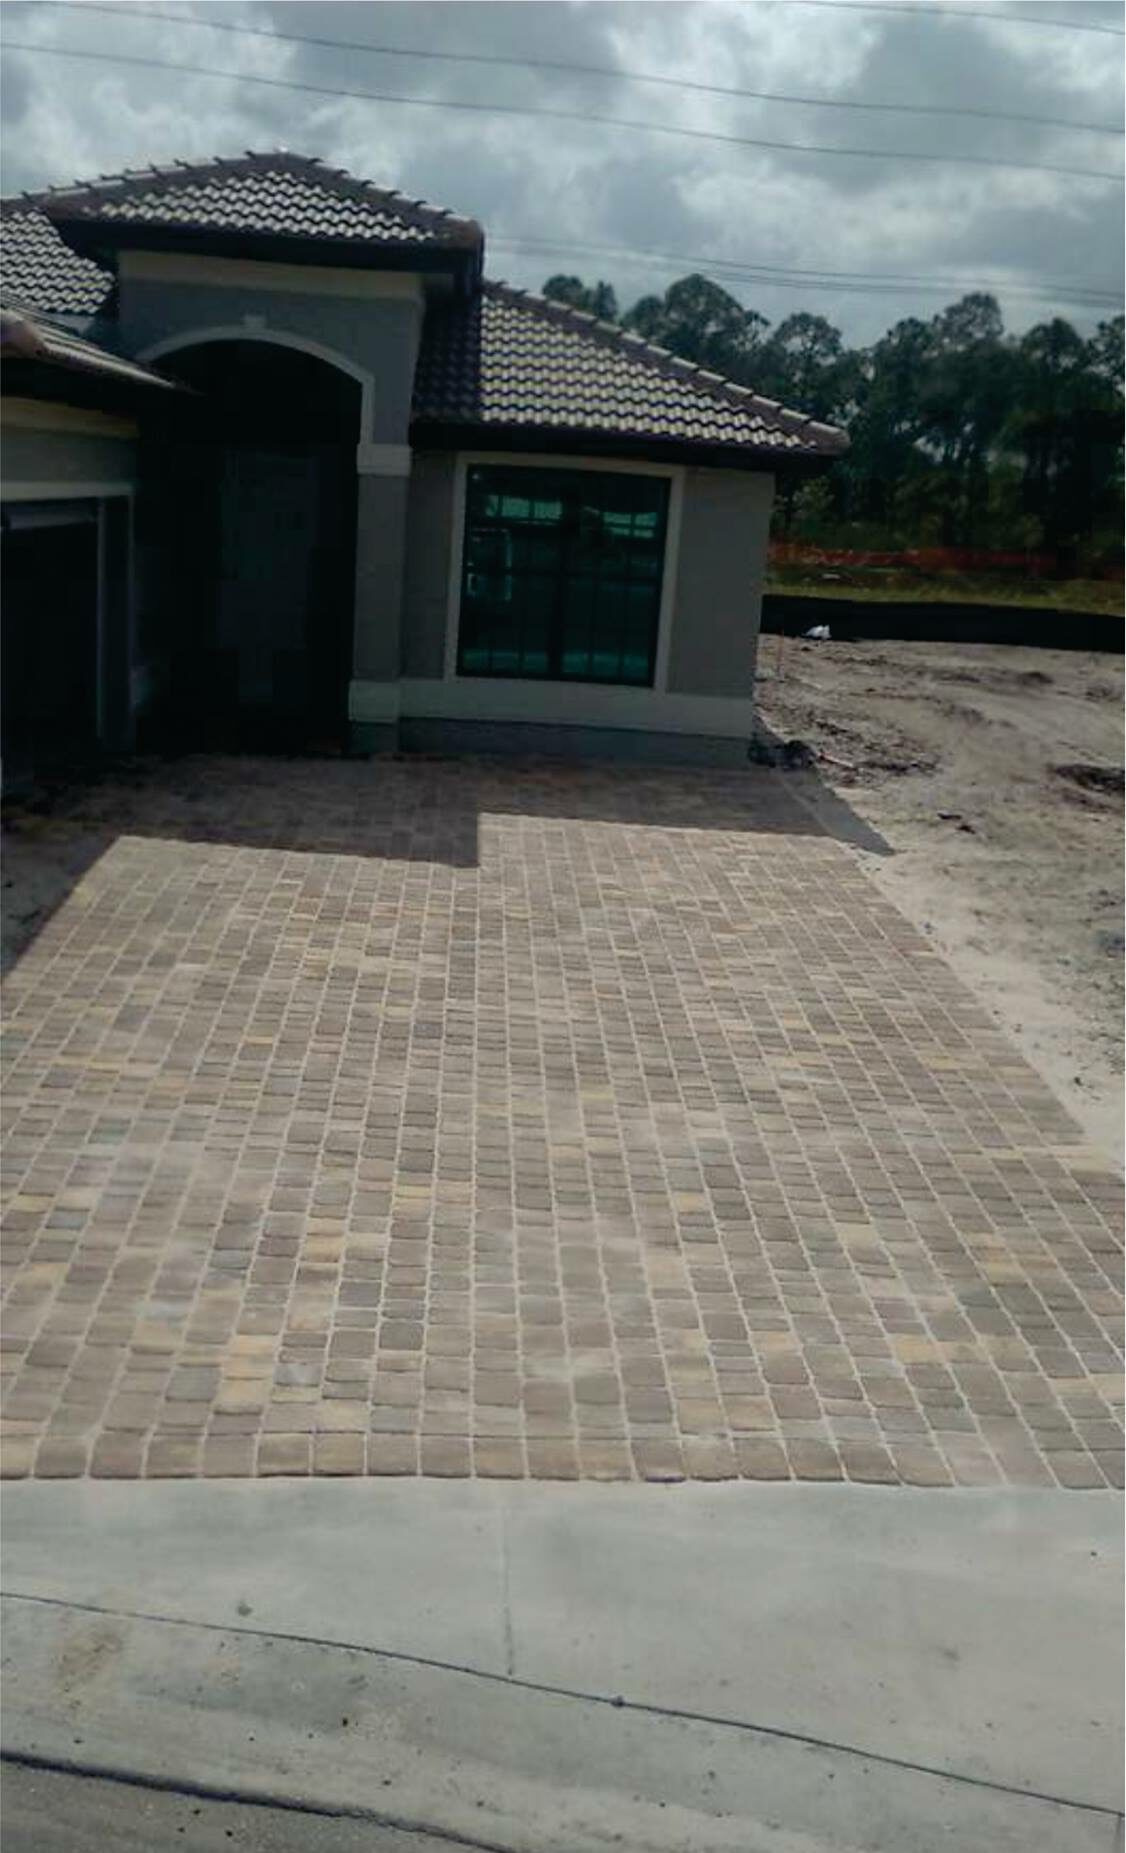 Professional Brick Sealing in West Palm Beach, FL